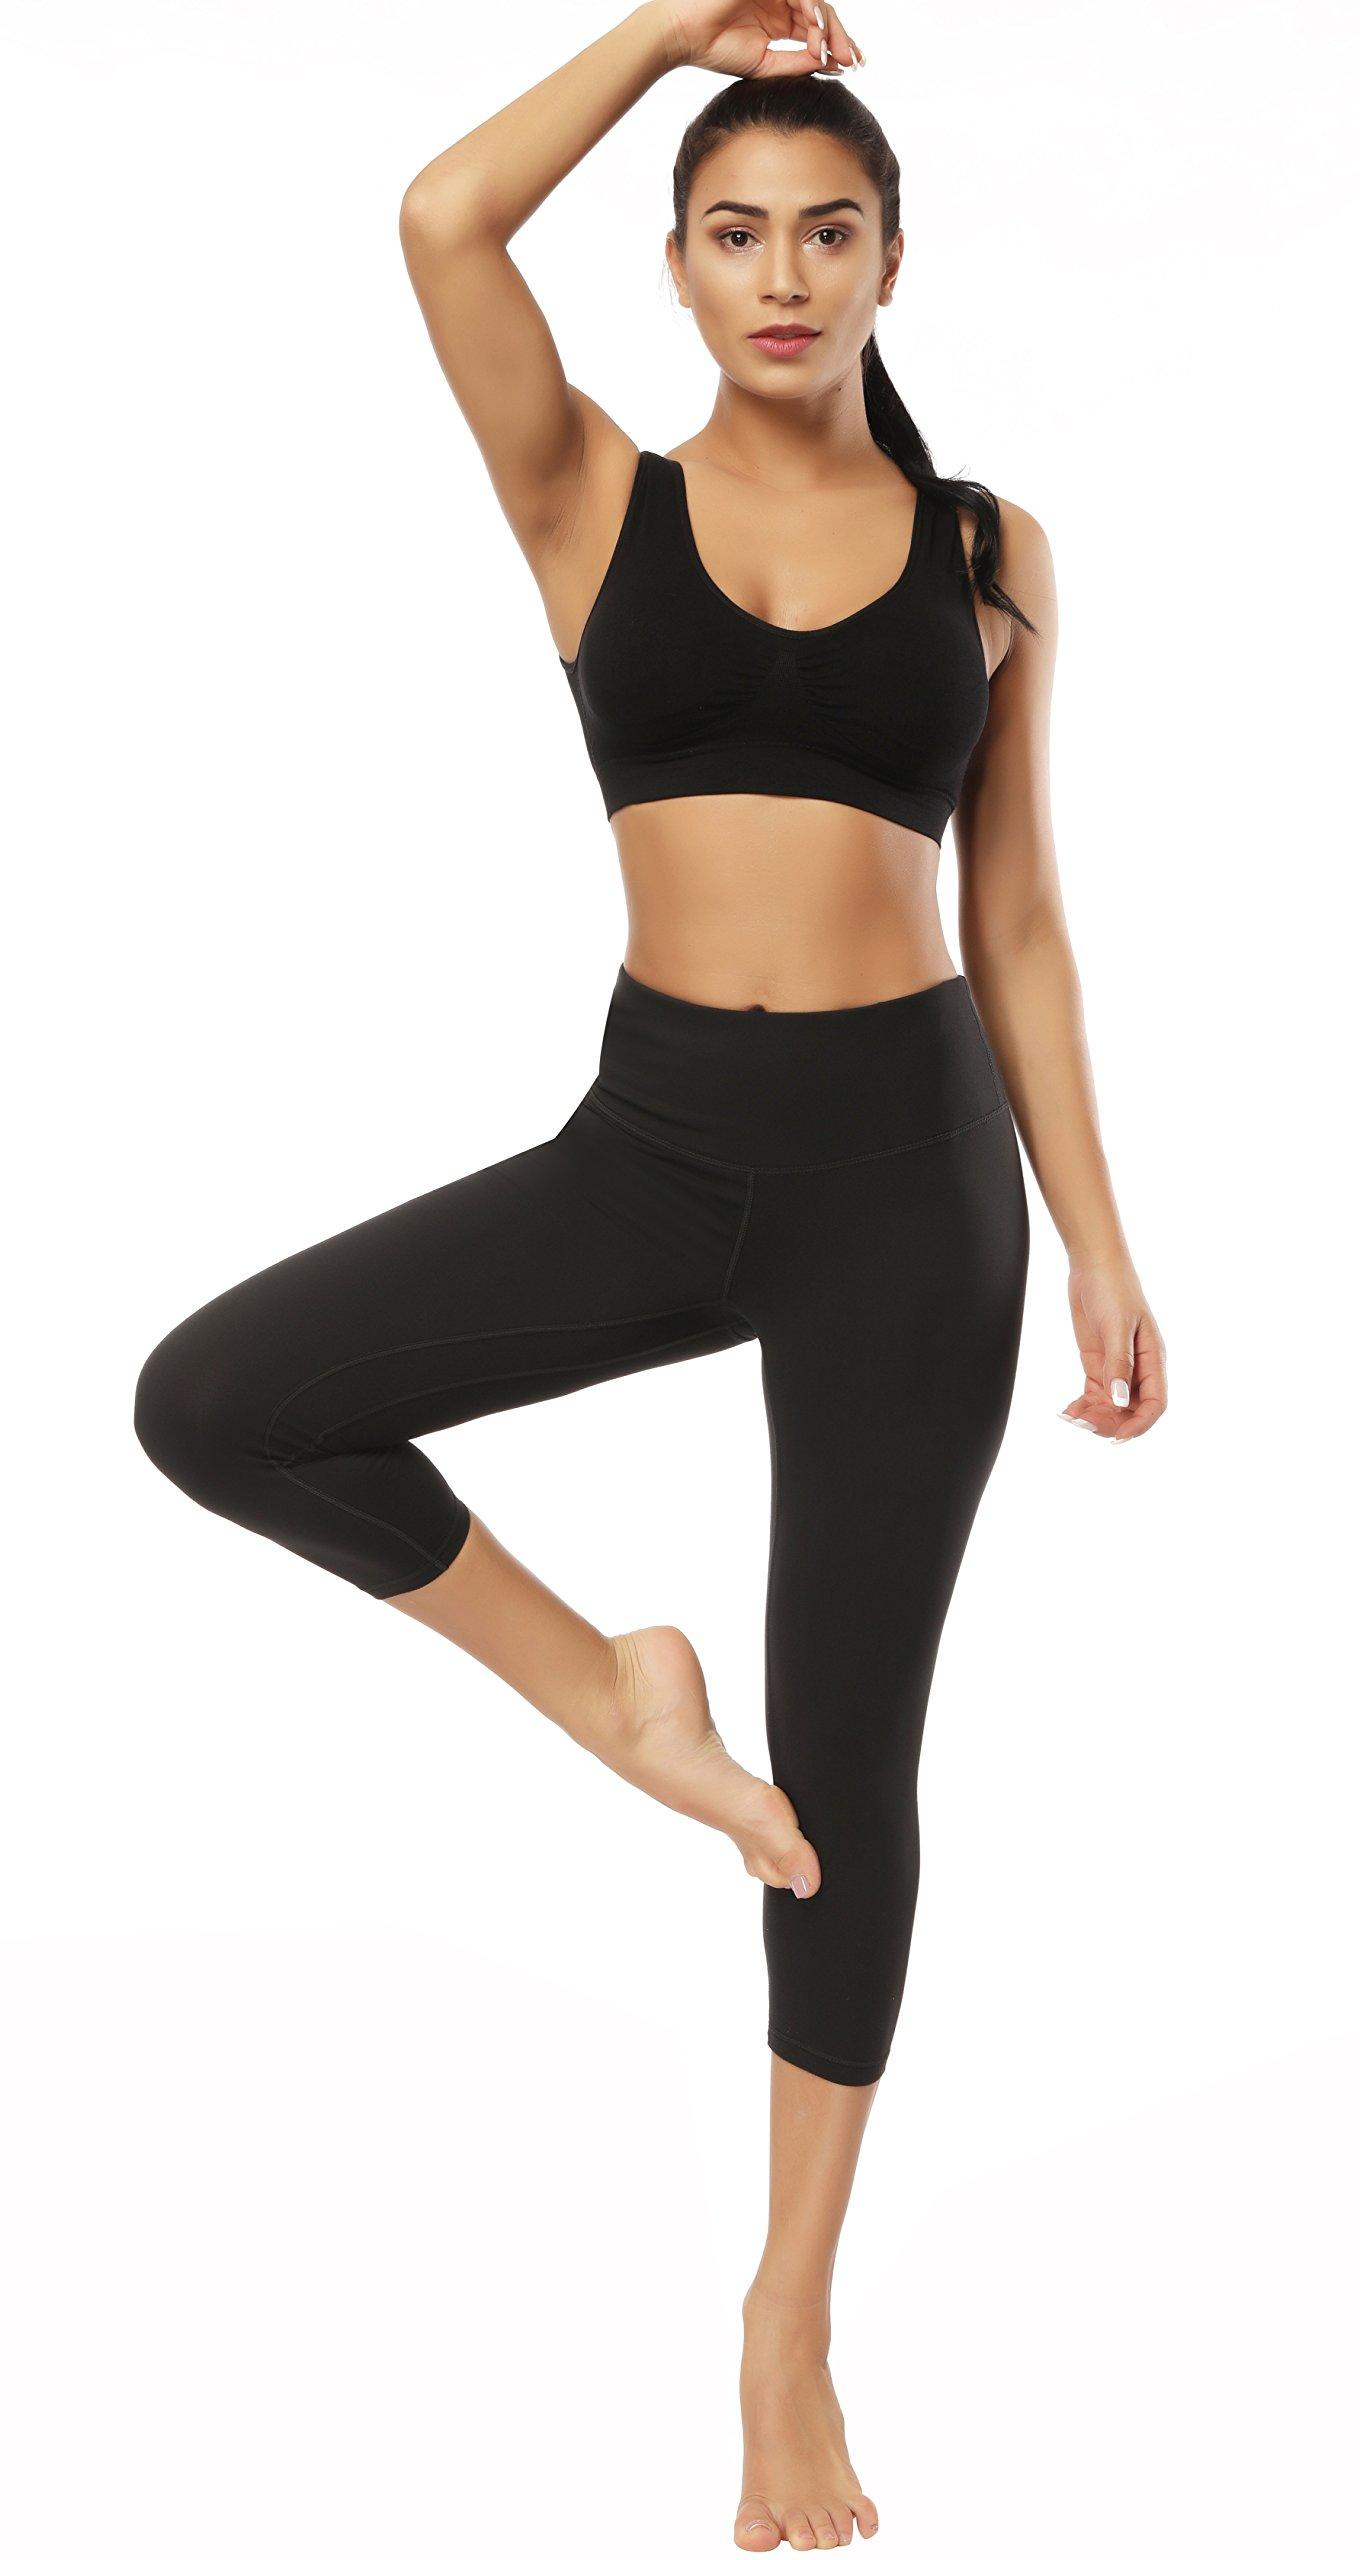 Fengbay Capris Leggings, Capris Yoga Pants Tummy Control Workout Running 4 Way Stretch High Waist Capris Workout Leggings by Fengbay (Image #5)